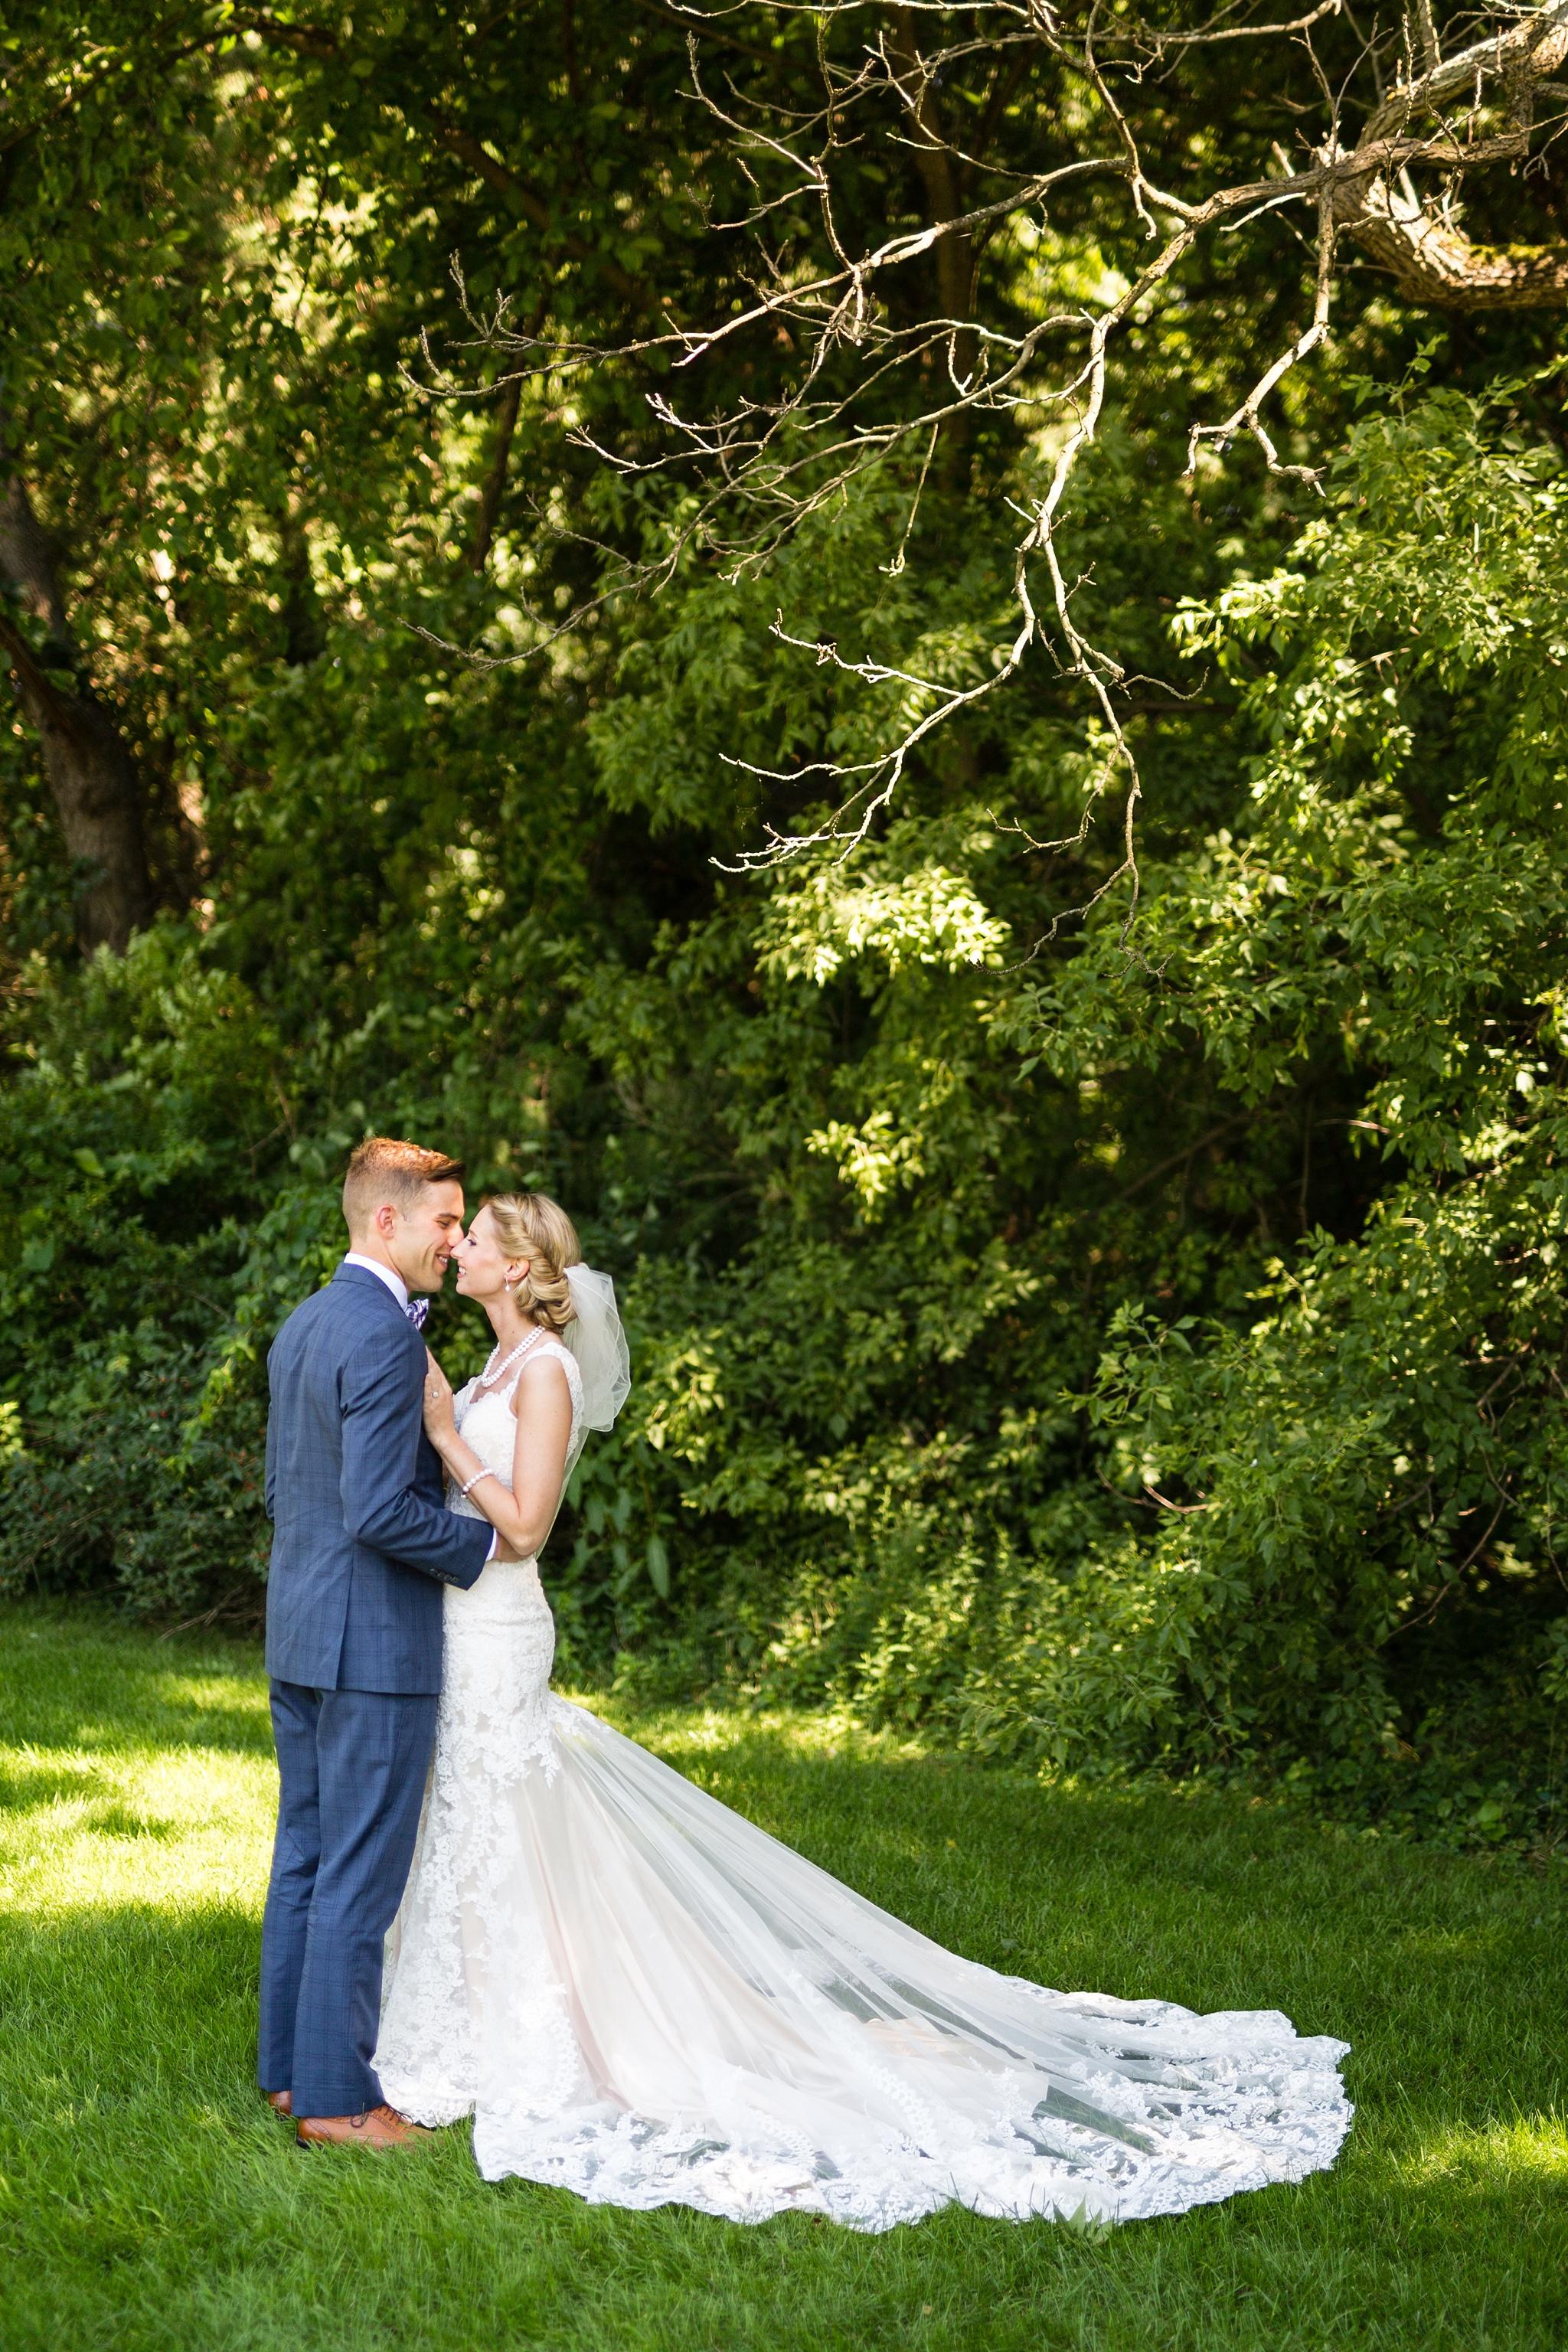 Becky_Cameron_Grand_Rapids_Blythefield Country_Club_Wedding023.JPG